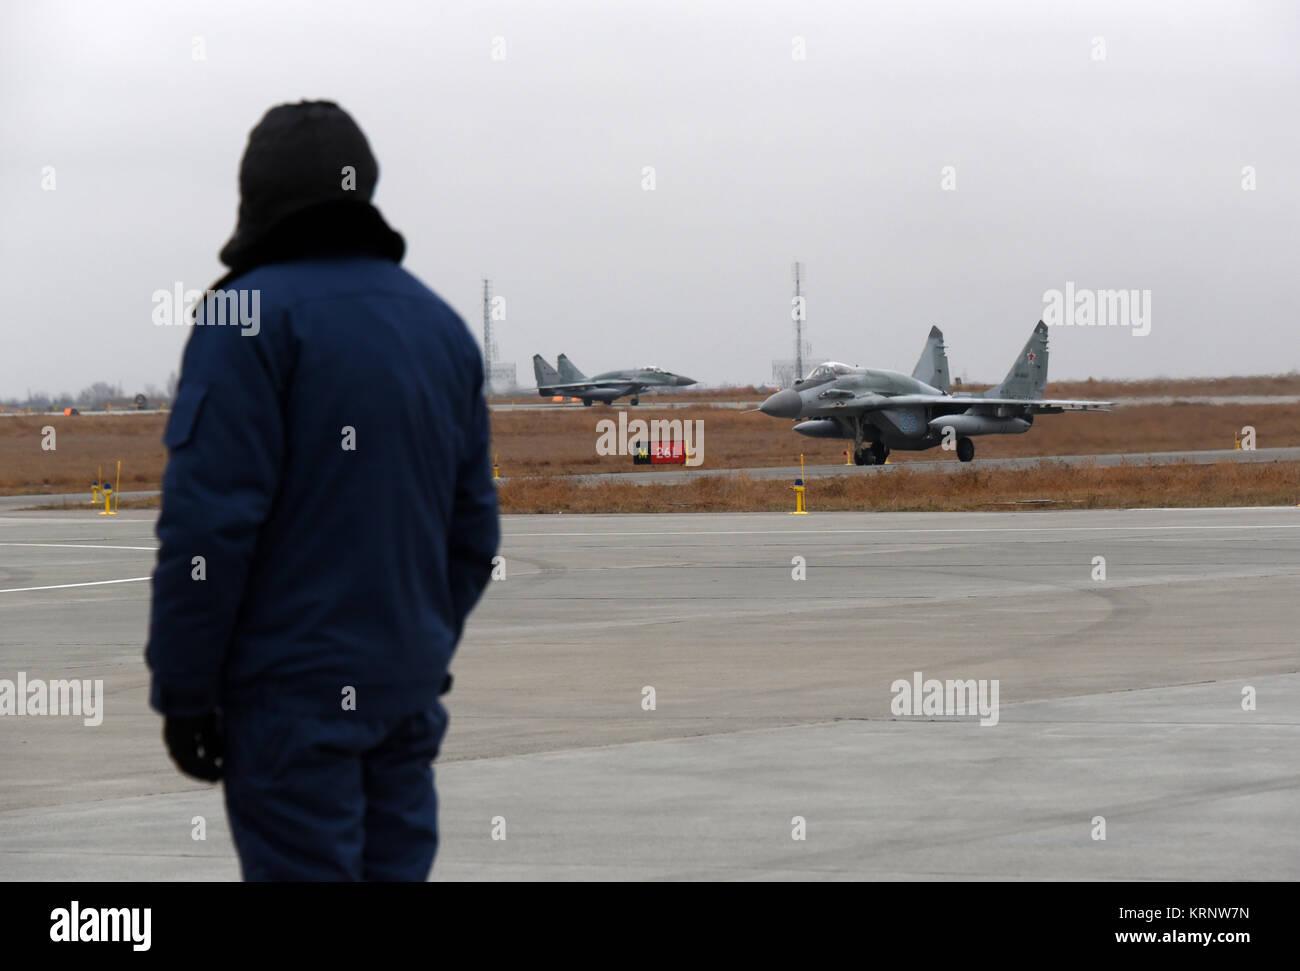 MIG-29 (MIG-29SMT) 'Fulcrum' fighter aircrafts landing after mission at the aerodrome 'Privolzhsky' - Stock Image